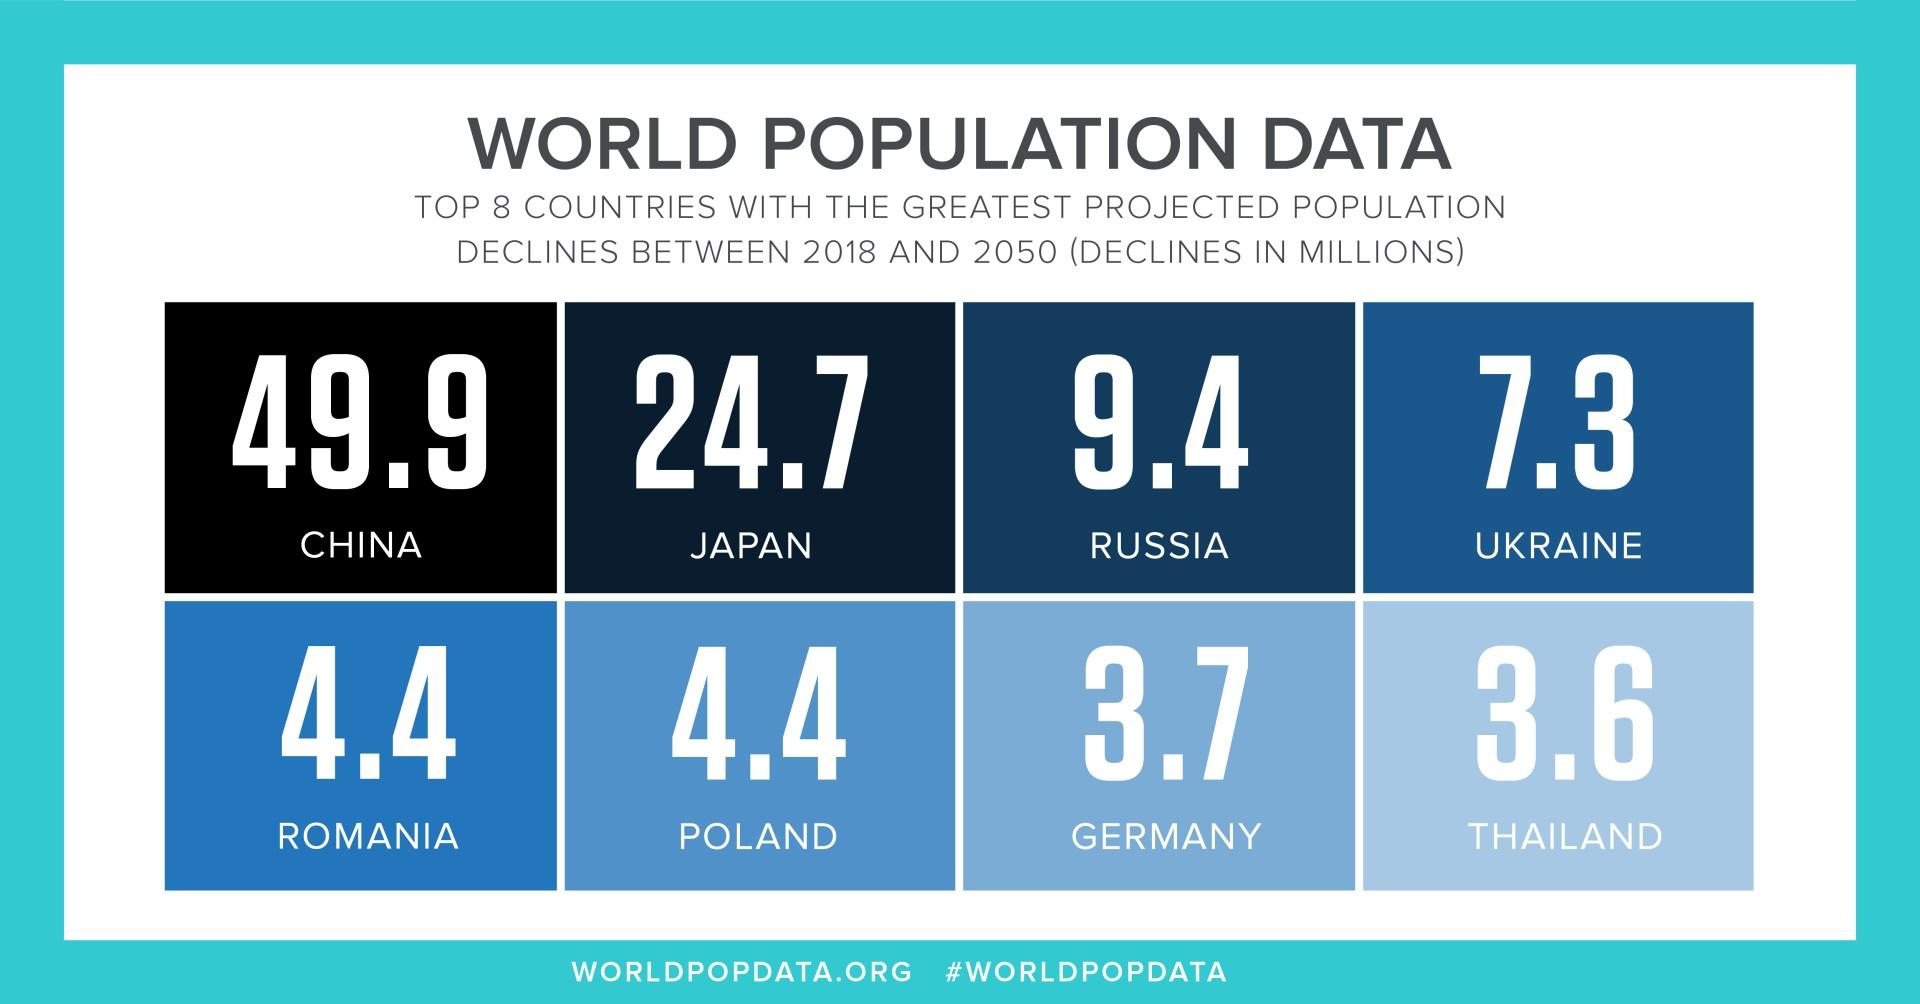 2050 population data